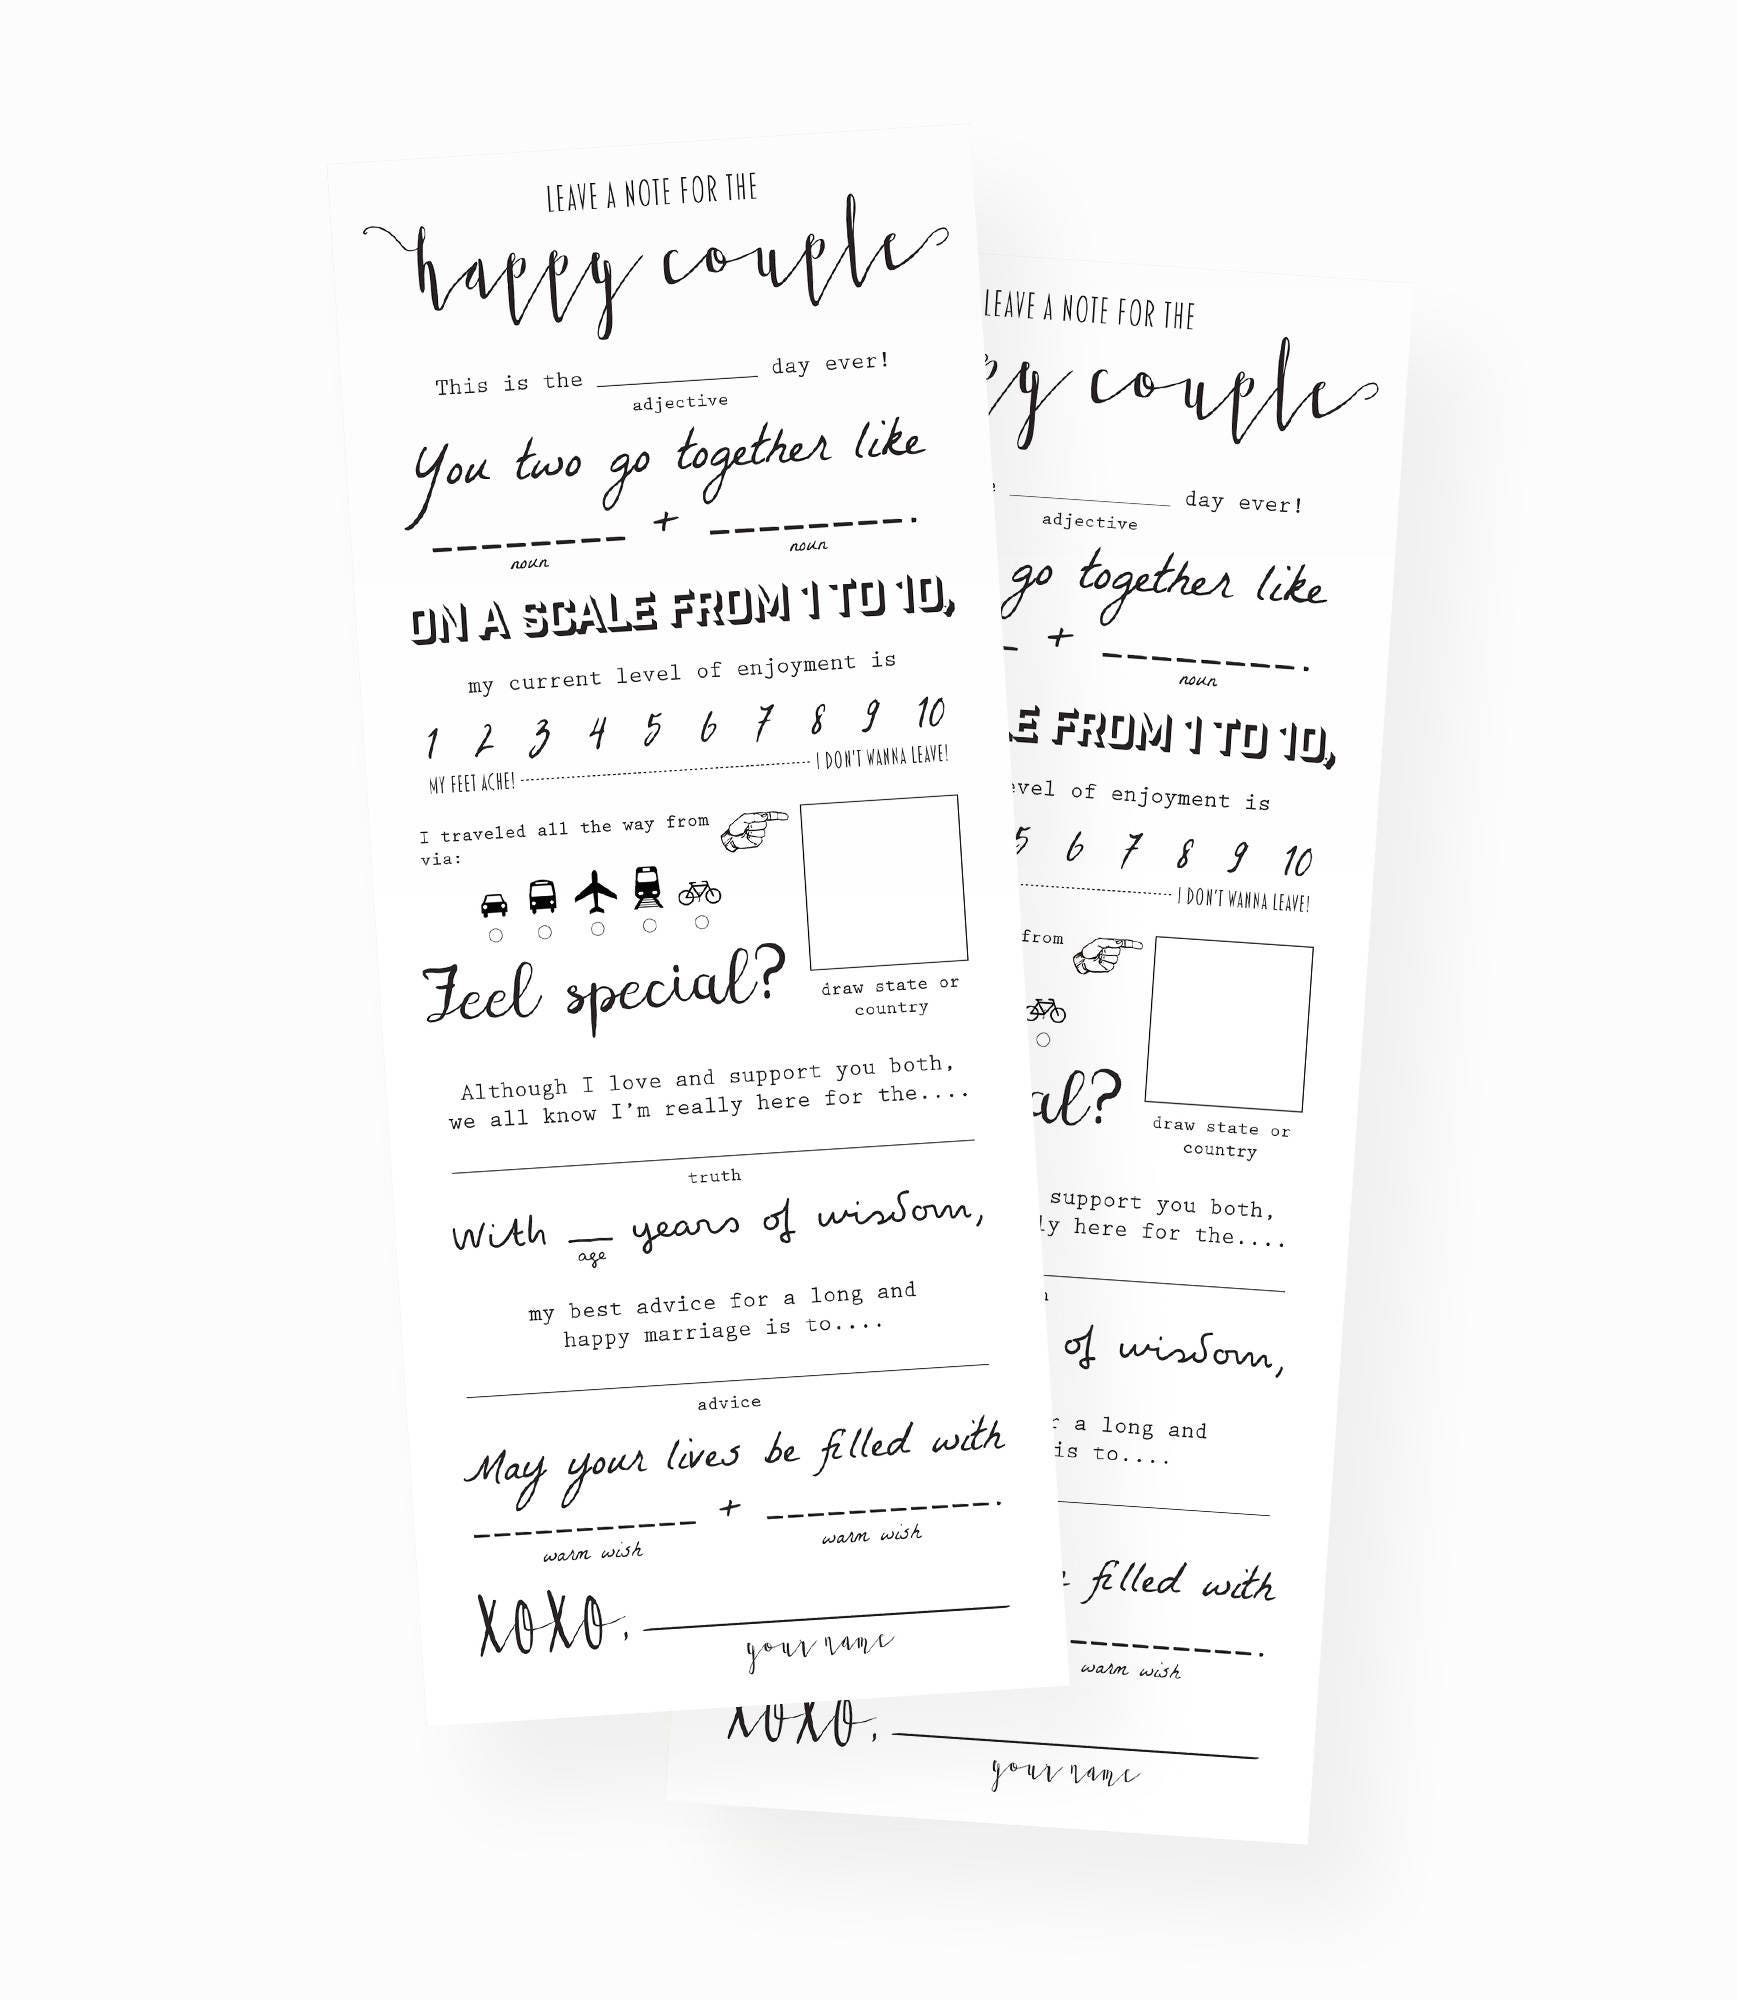 wedding mad libs wedding keepsake marriage advice cards etsy